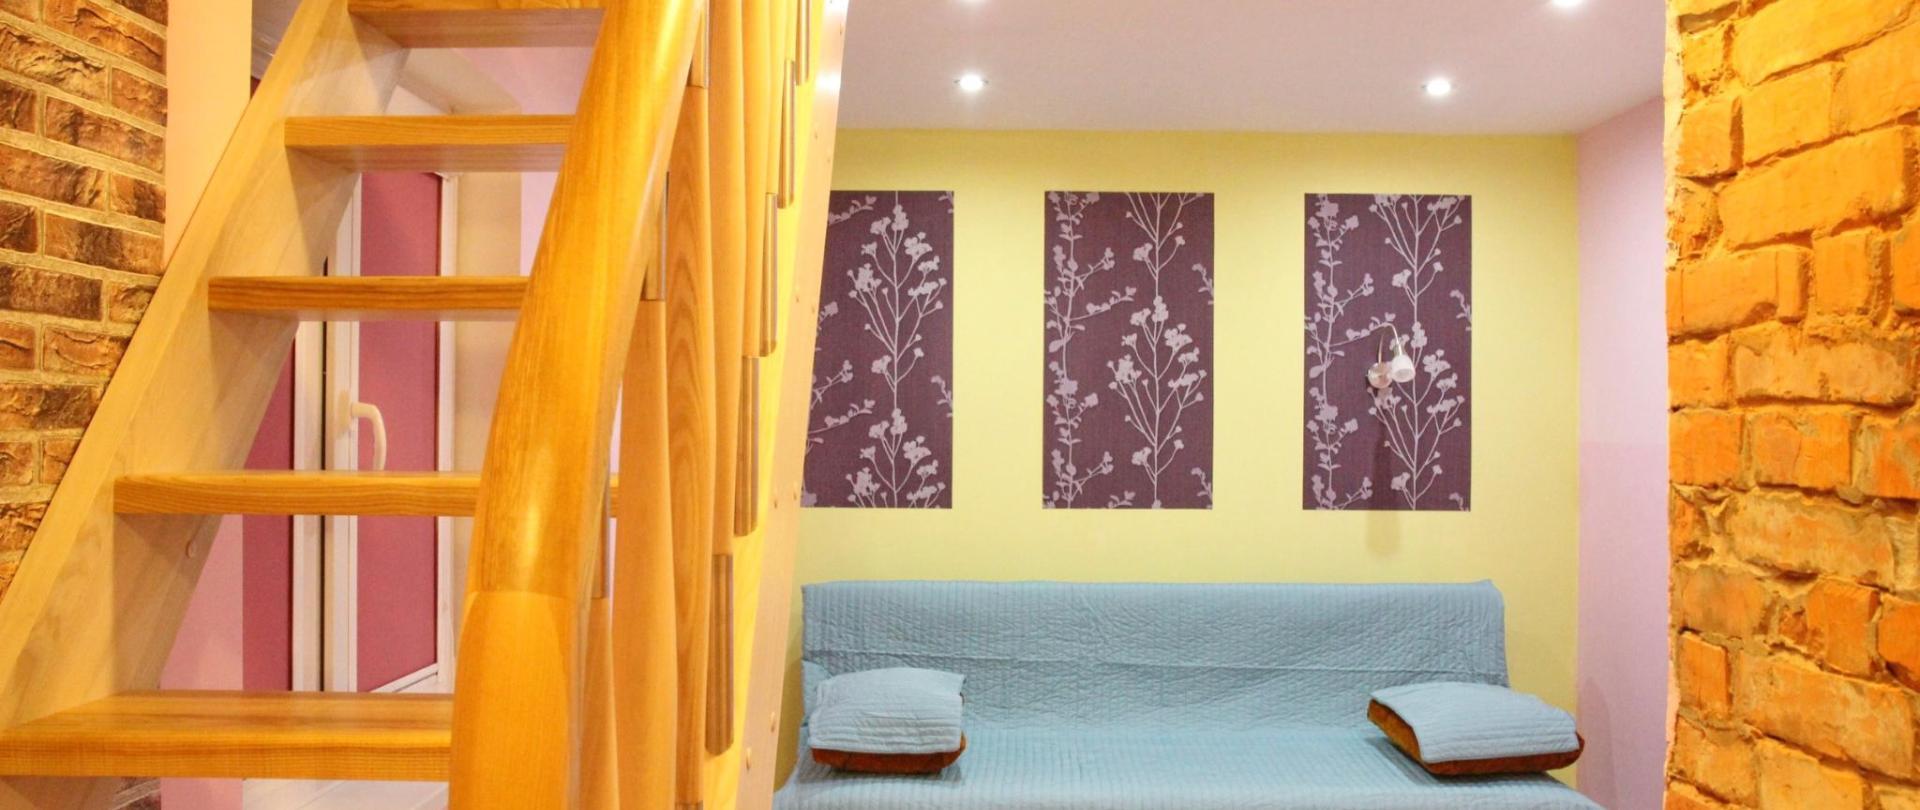 A apartement pensjonatu Inkaras Palanga 2406 x 1603.jpg